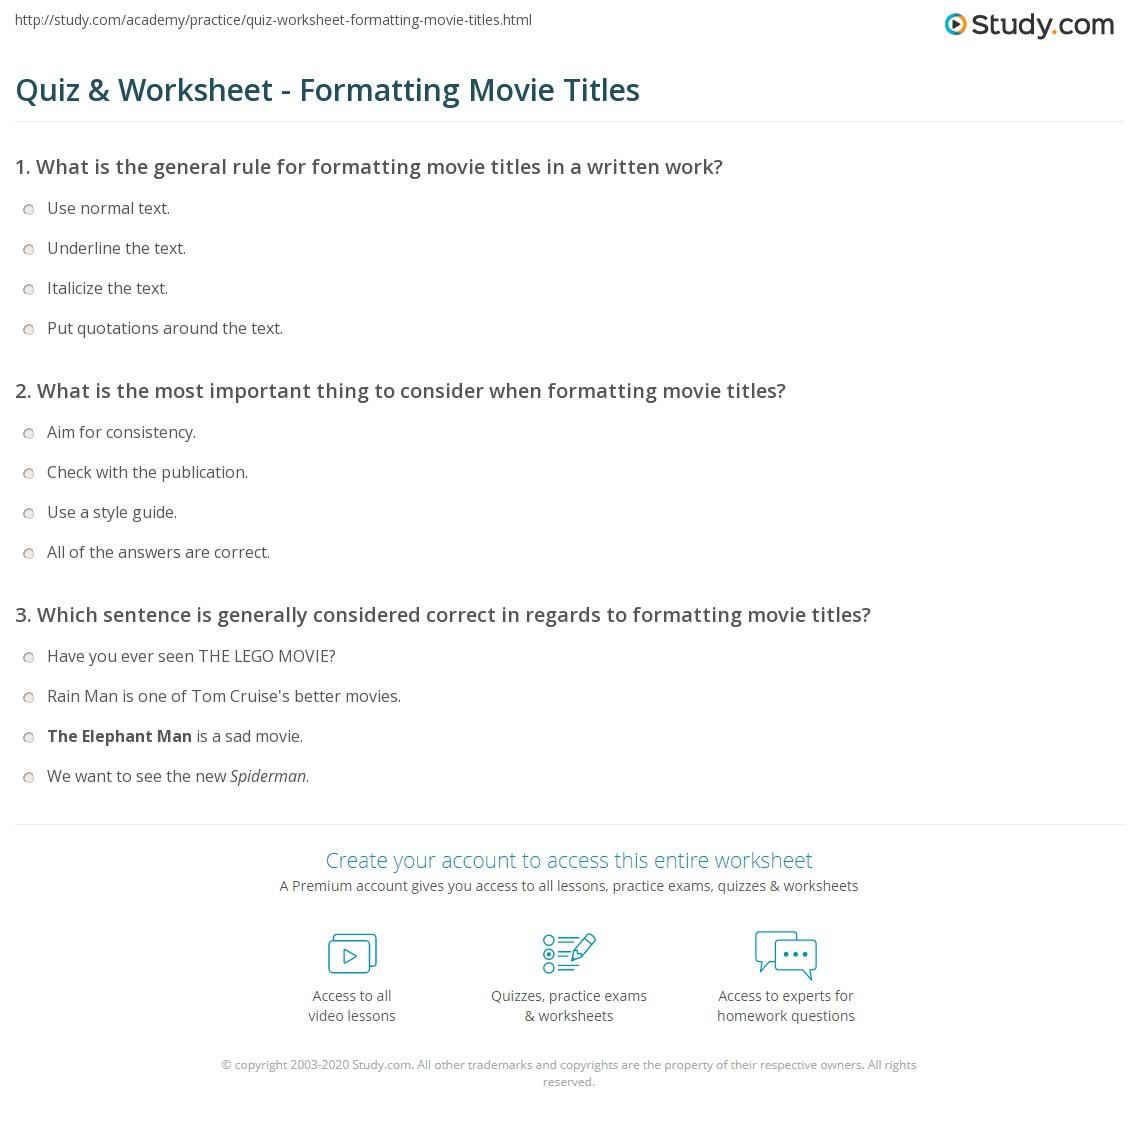 Quiz & Worksheet - Formatting Movie Titles | Study com